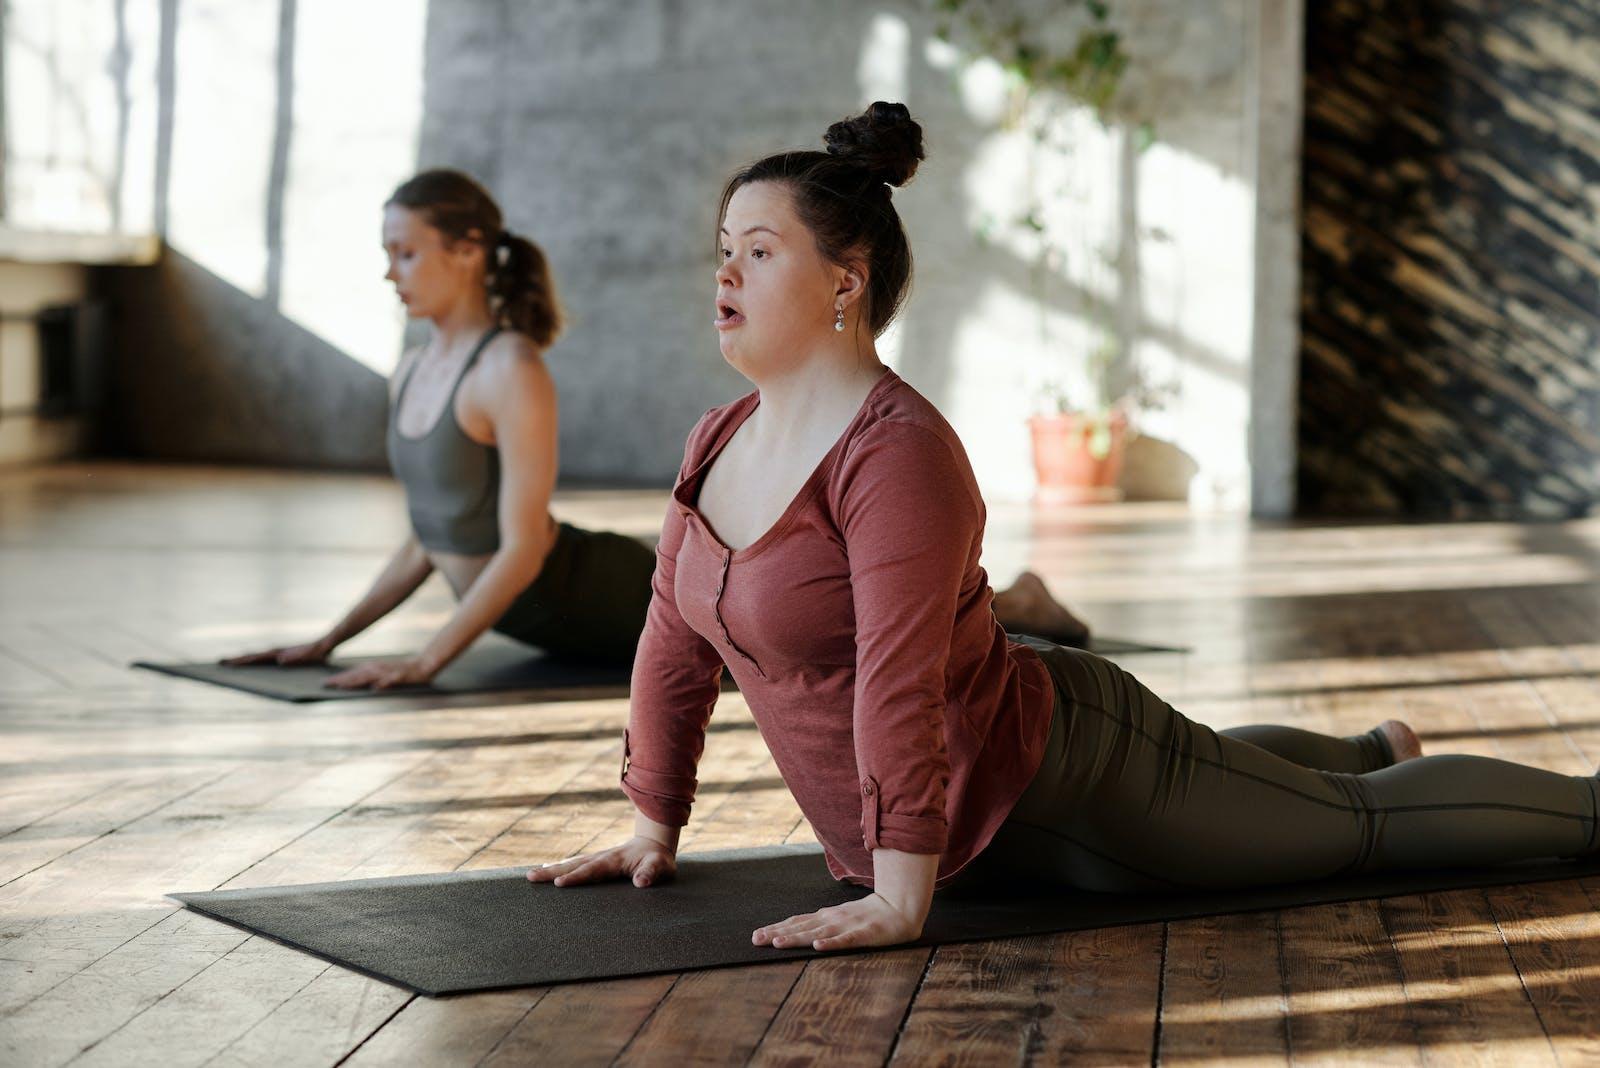 Yoga and Body Image Coalition